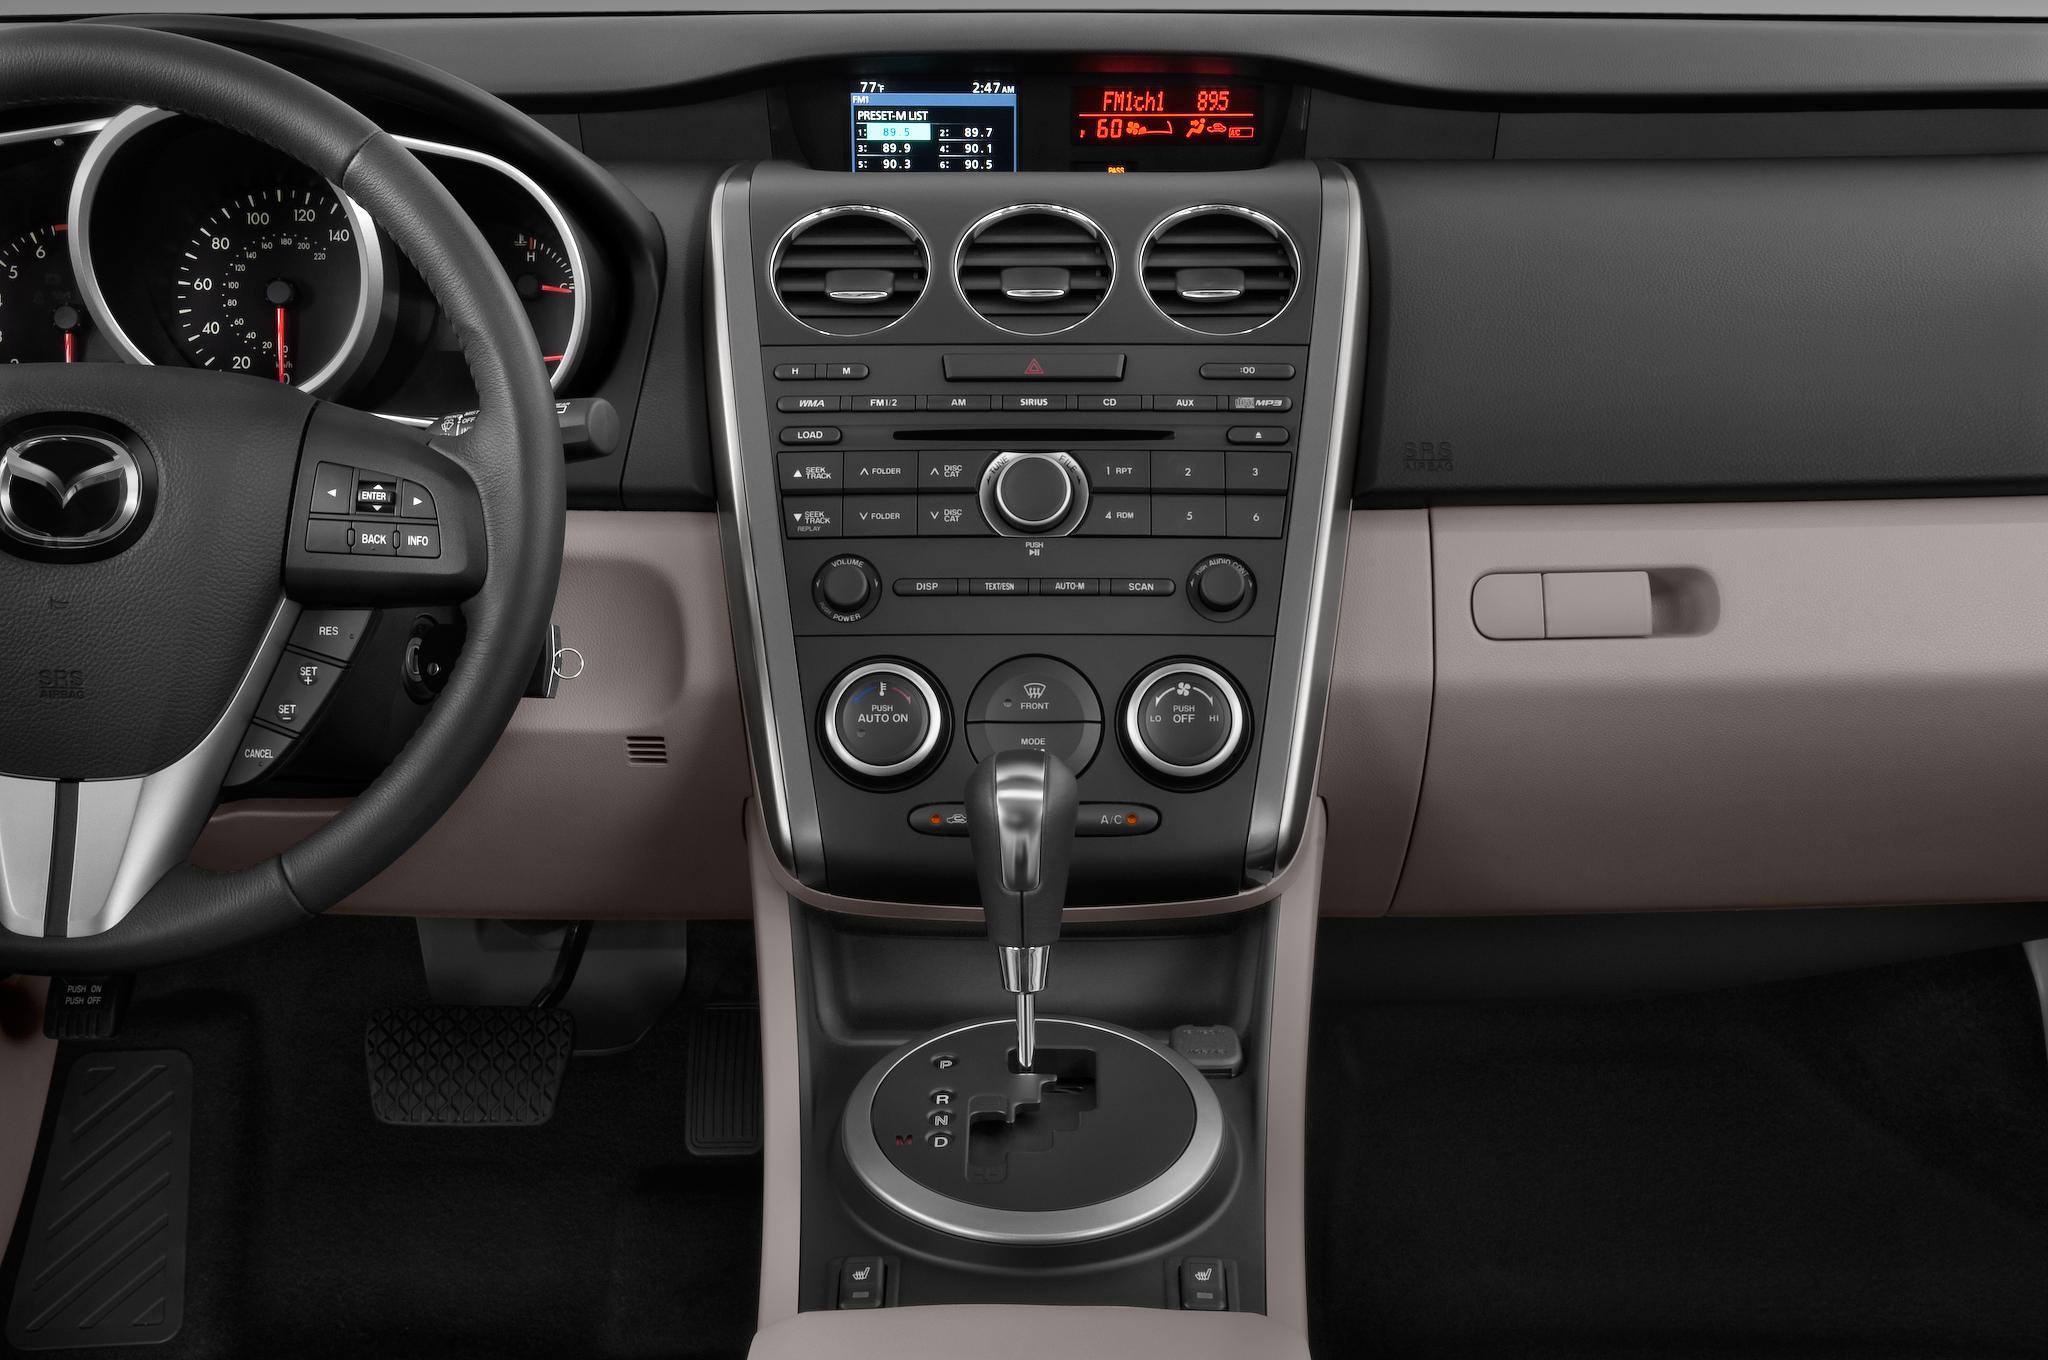 https://st.automobilemag.com/uploads/sites/10/2015/11/2010-mazda-cx7-i-sport-suv-instrument-panel.png